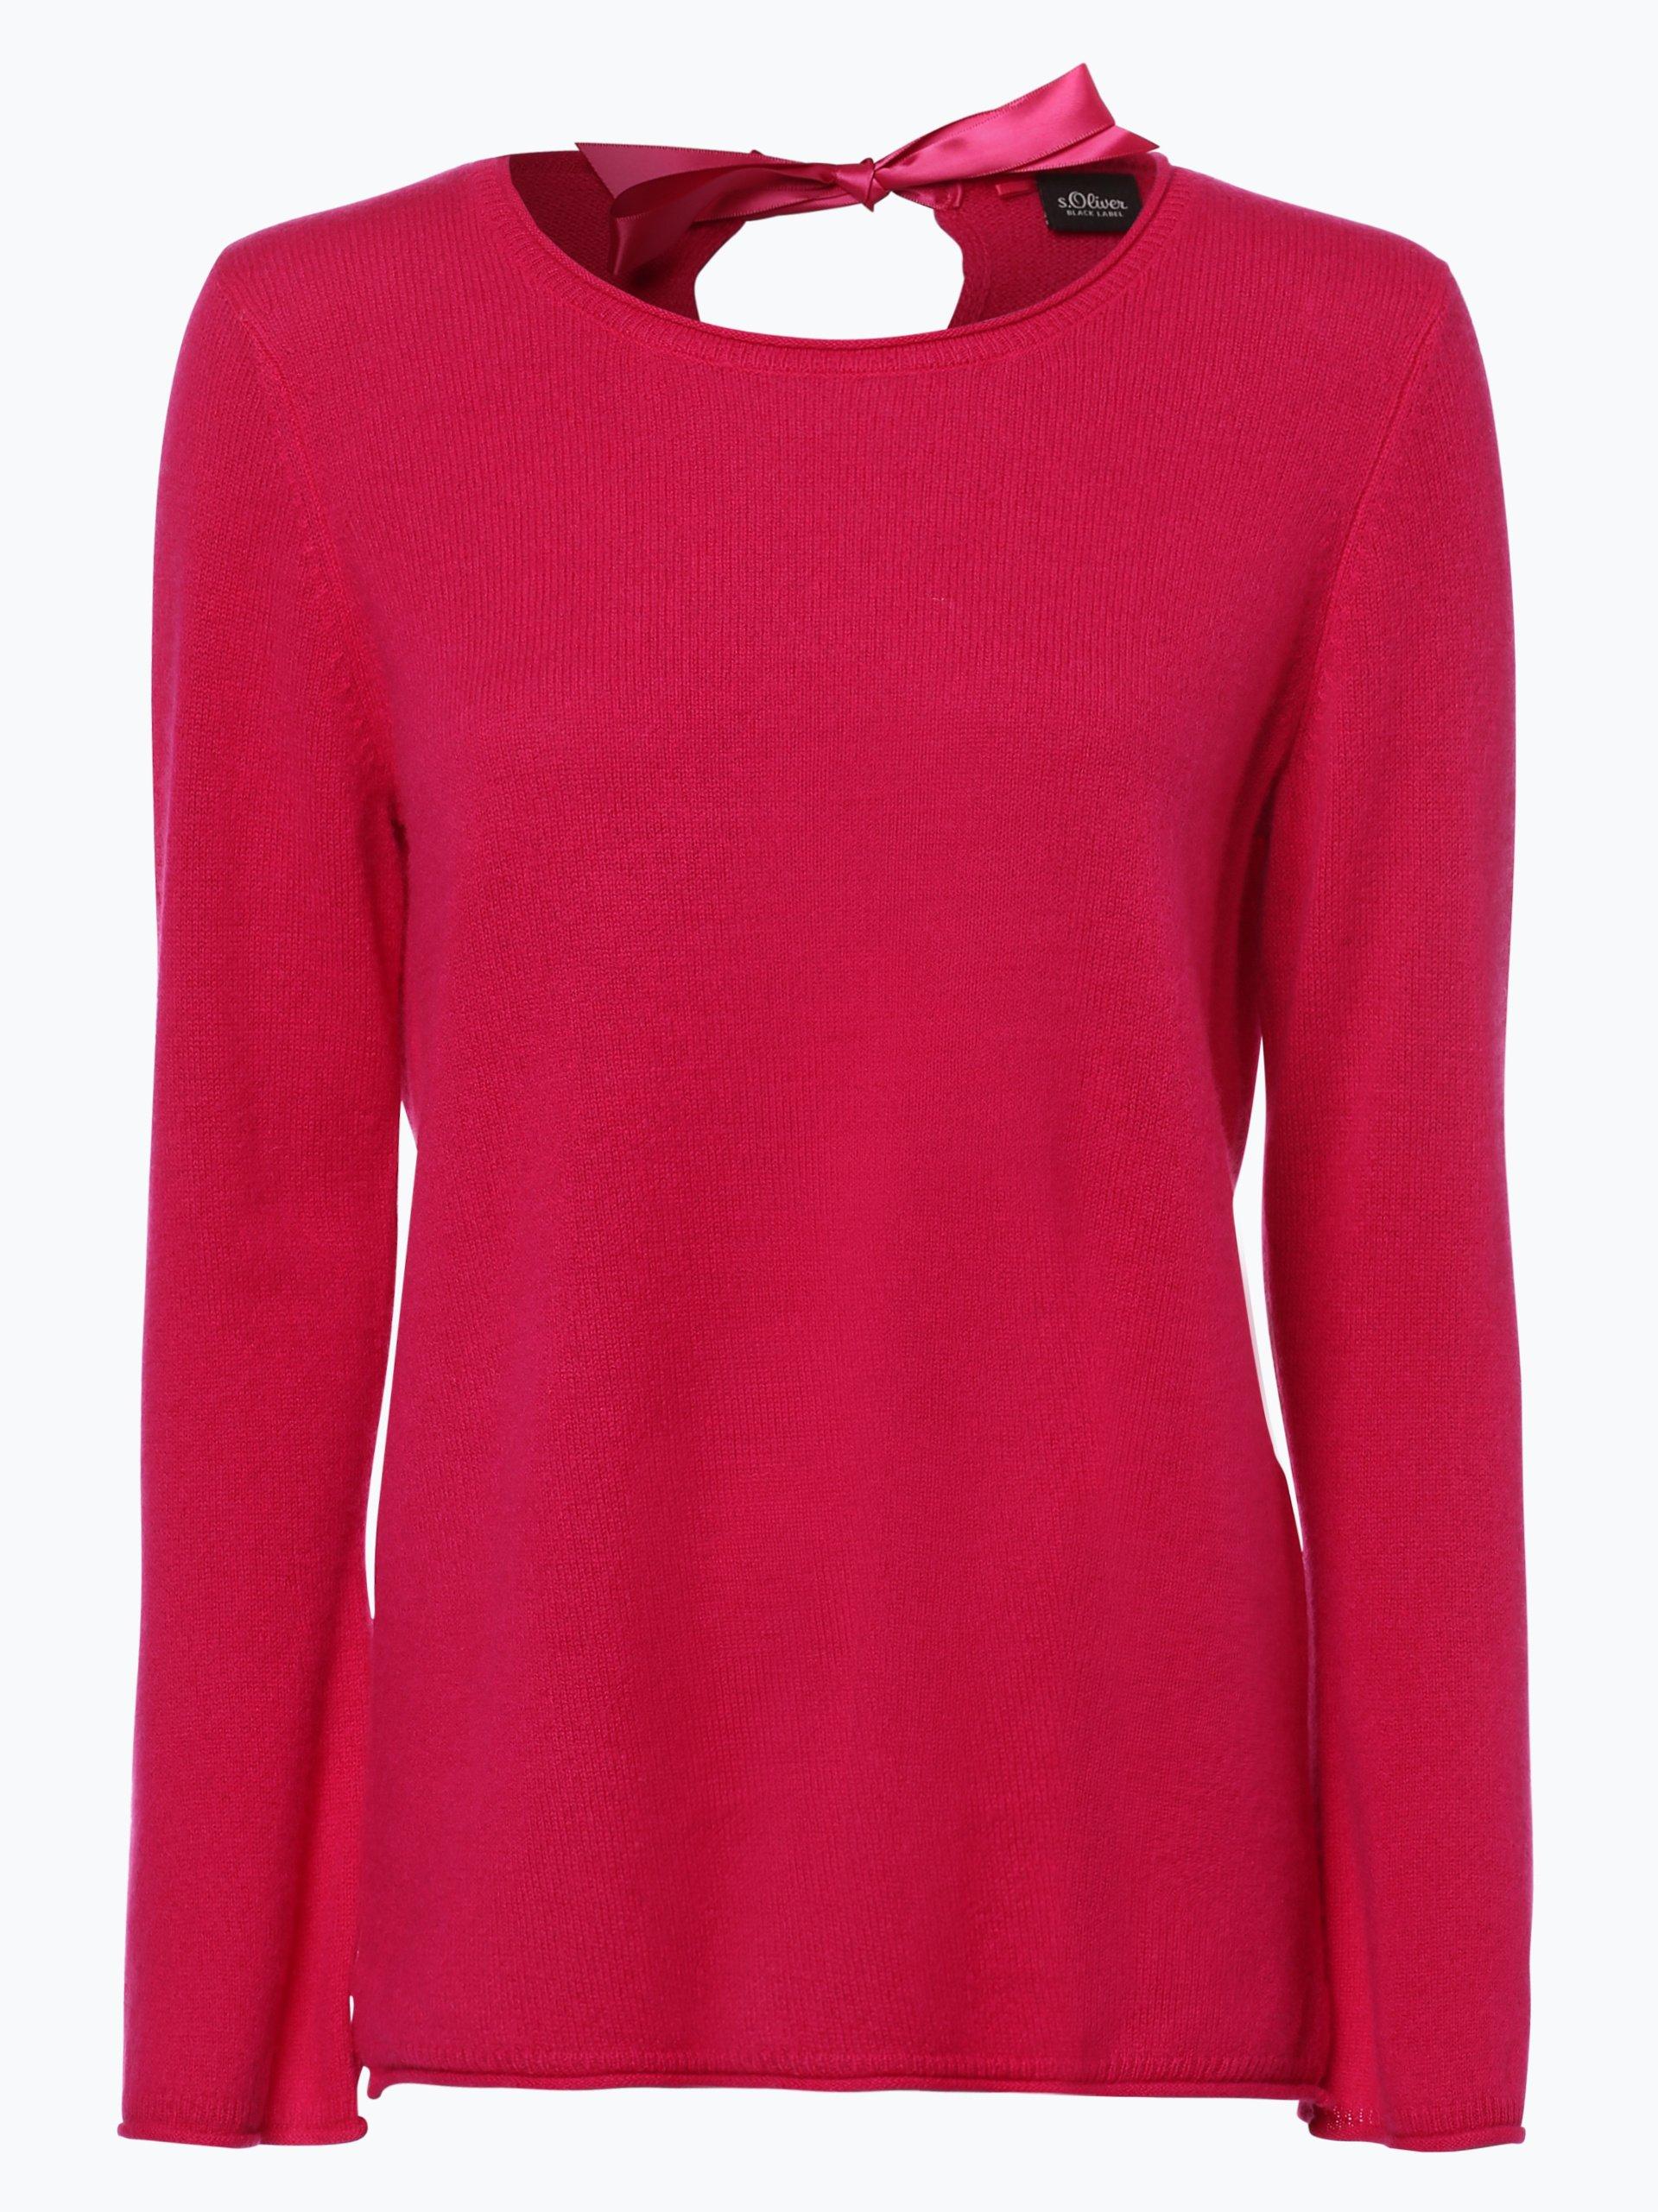 s oliver black label damen pure cashmere pullover pink uni online kaufen peek und cloppenburg de. Black Bedroom Furniture Sets. Home Design Ideas